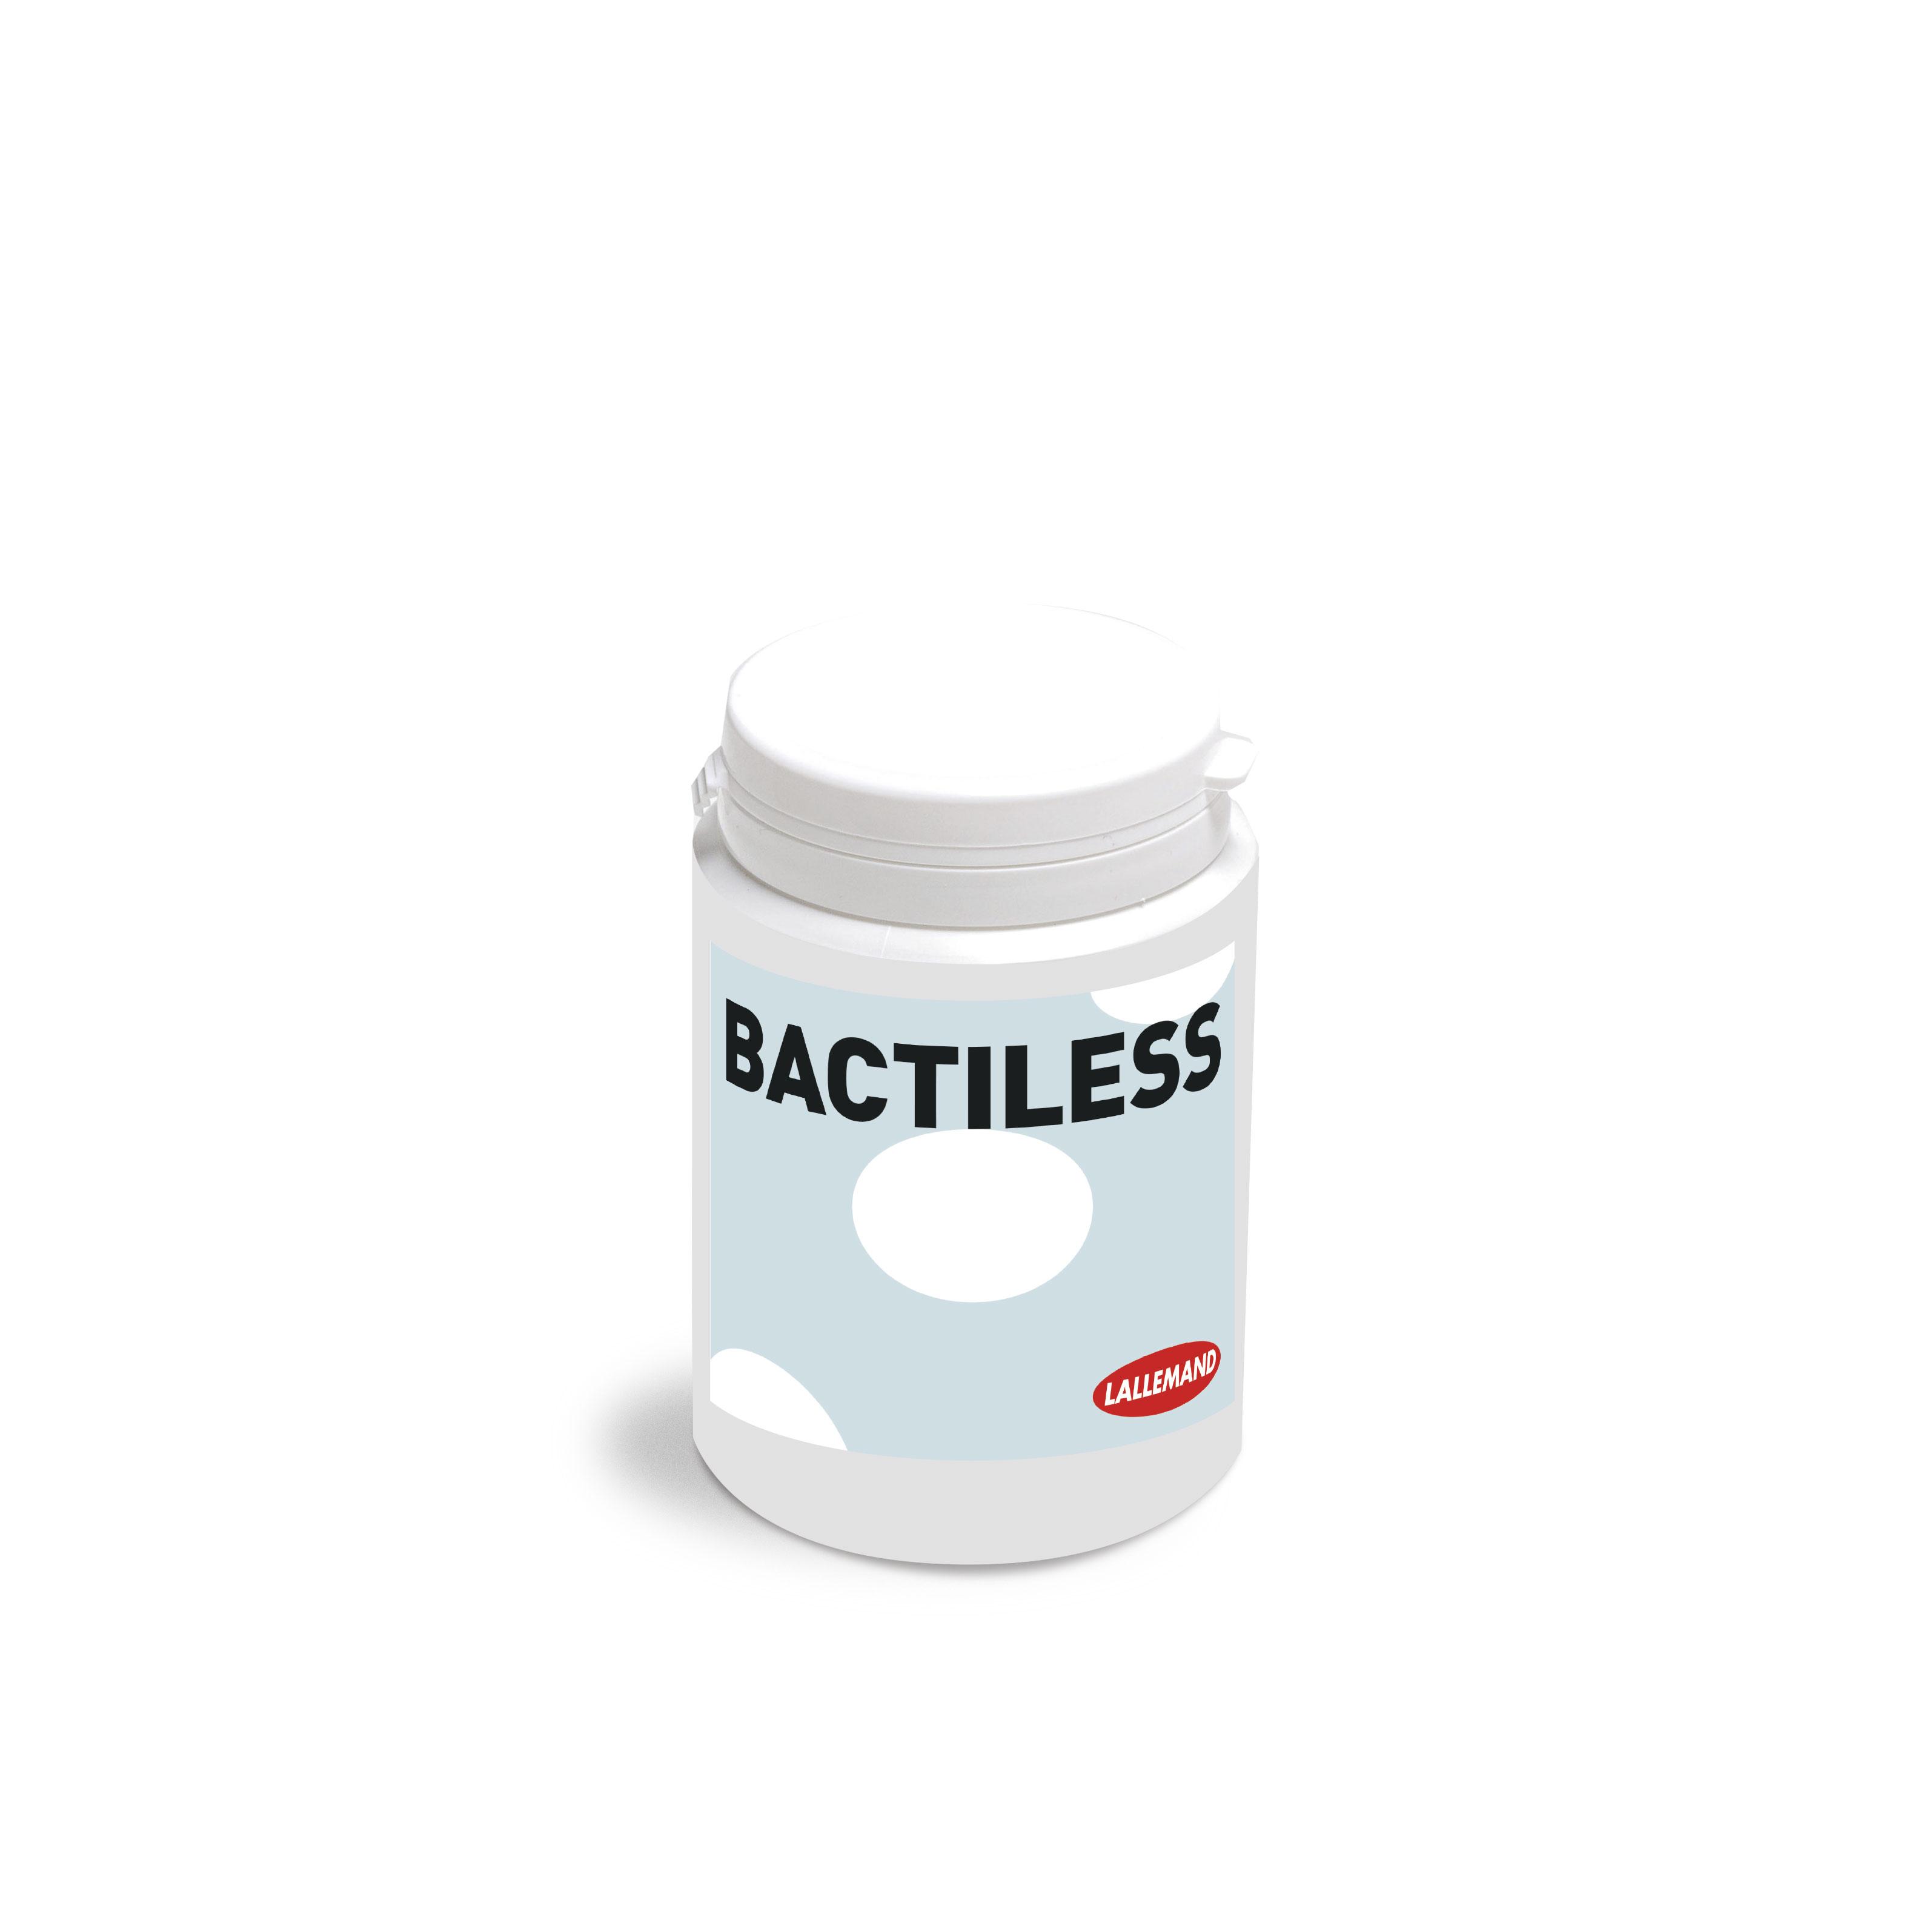 Soluciones Naturales – BACTILESS™: Control de Bacterias Nocivas